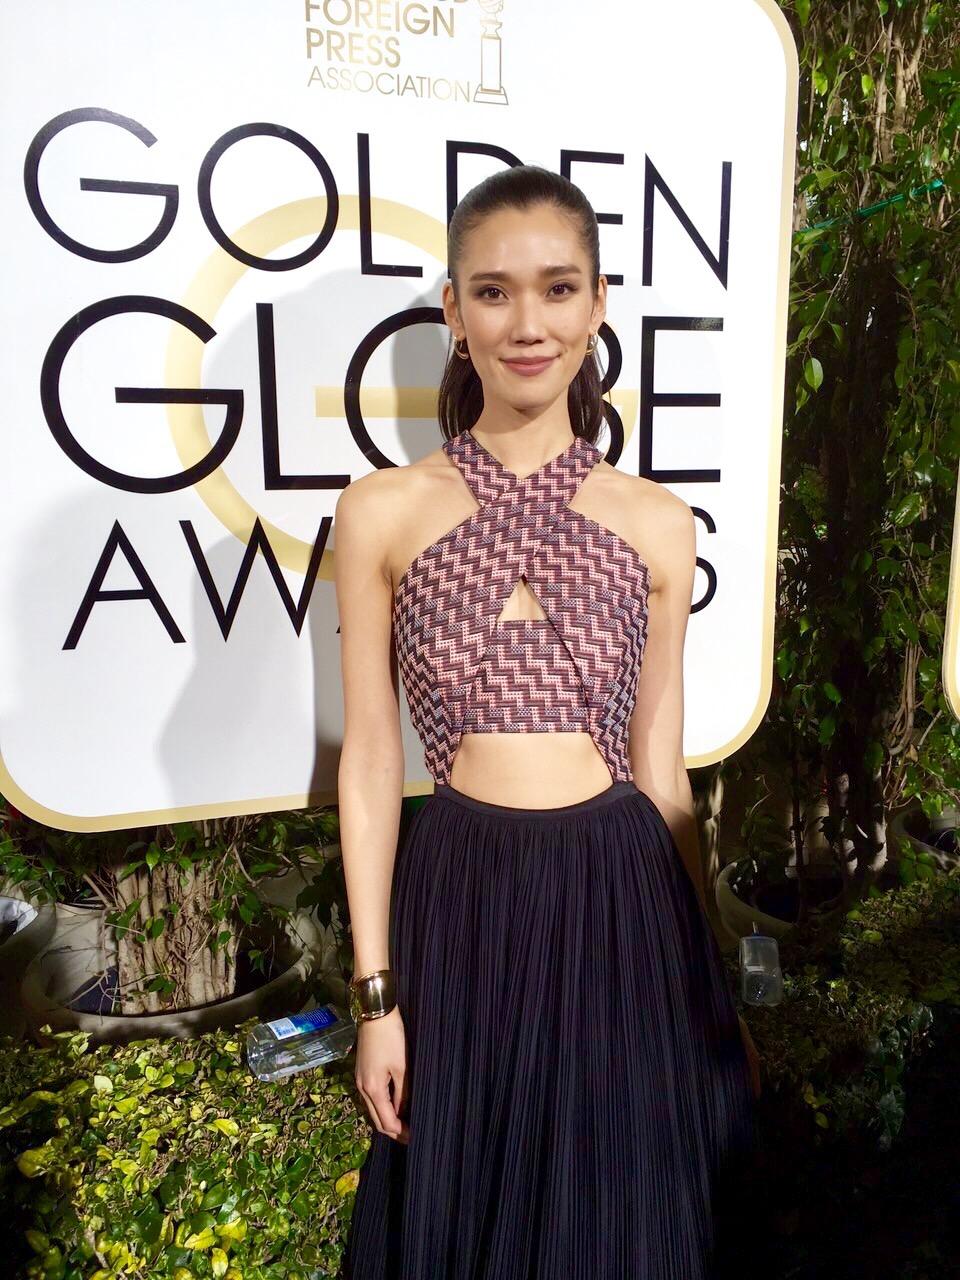 Tao Okamoto / Golden Globes 16